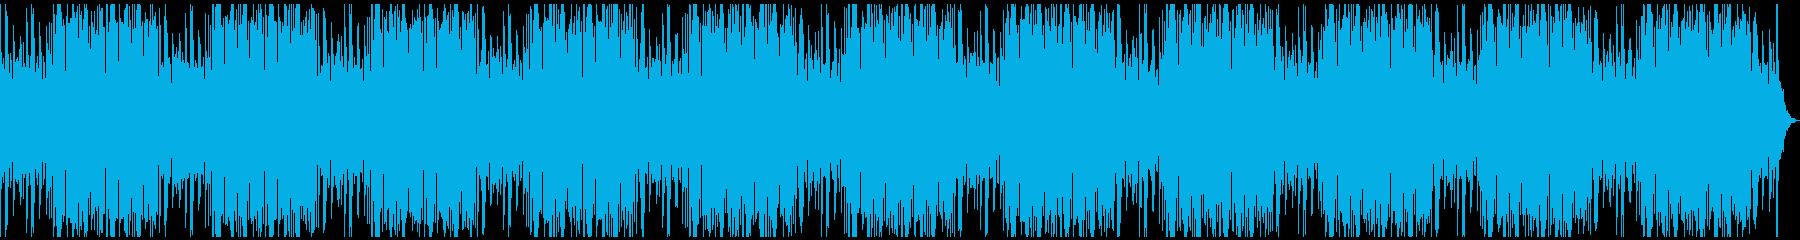 Lofiな和風チルアウトの再生済みの波形